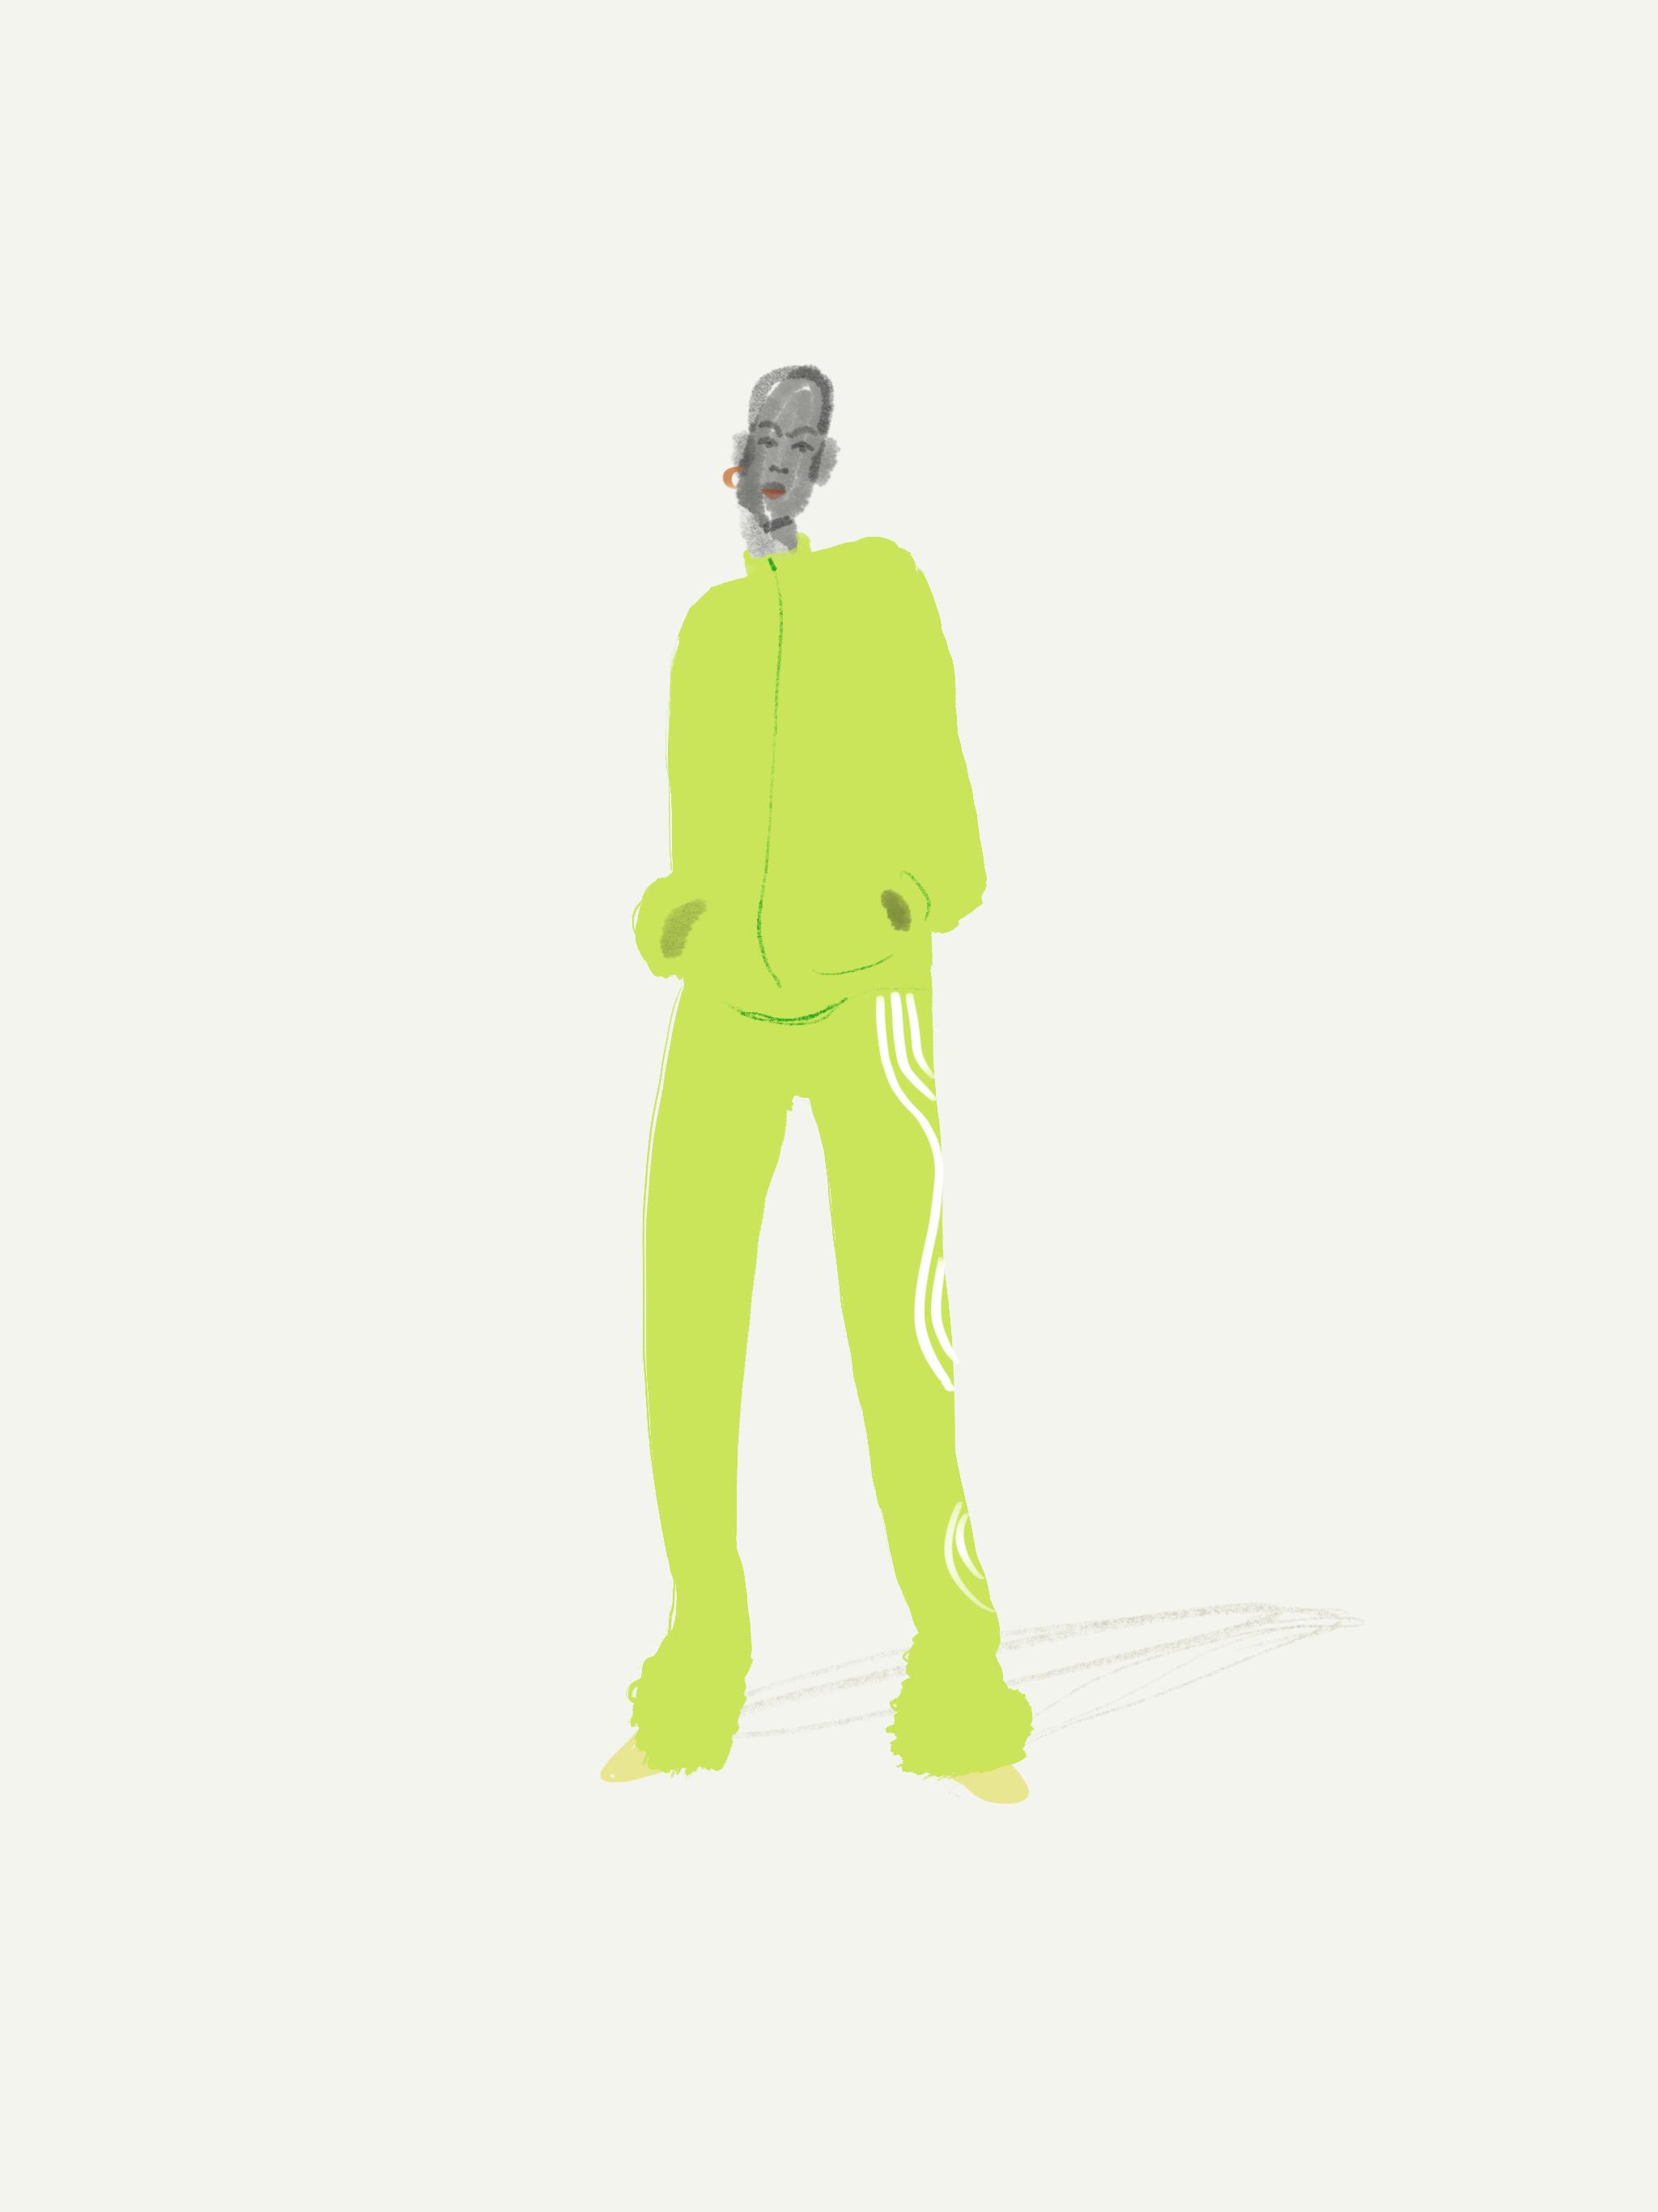 Fashion Illustration by Silvana Mariani